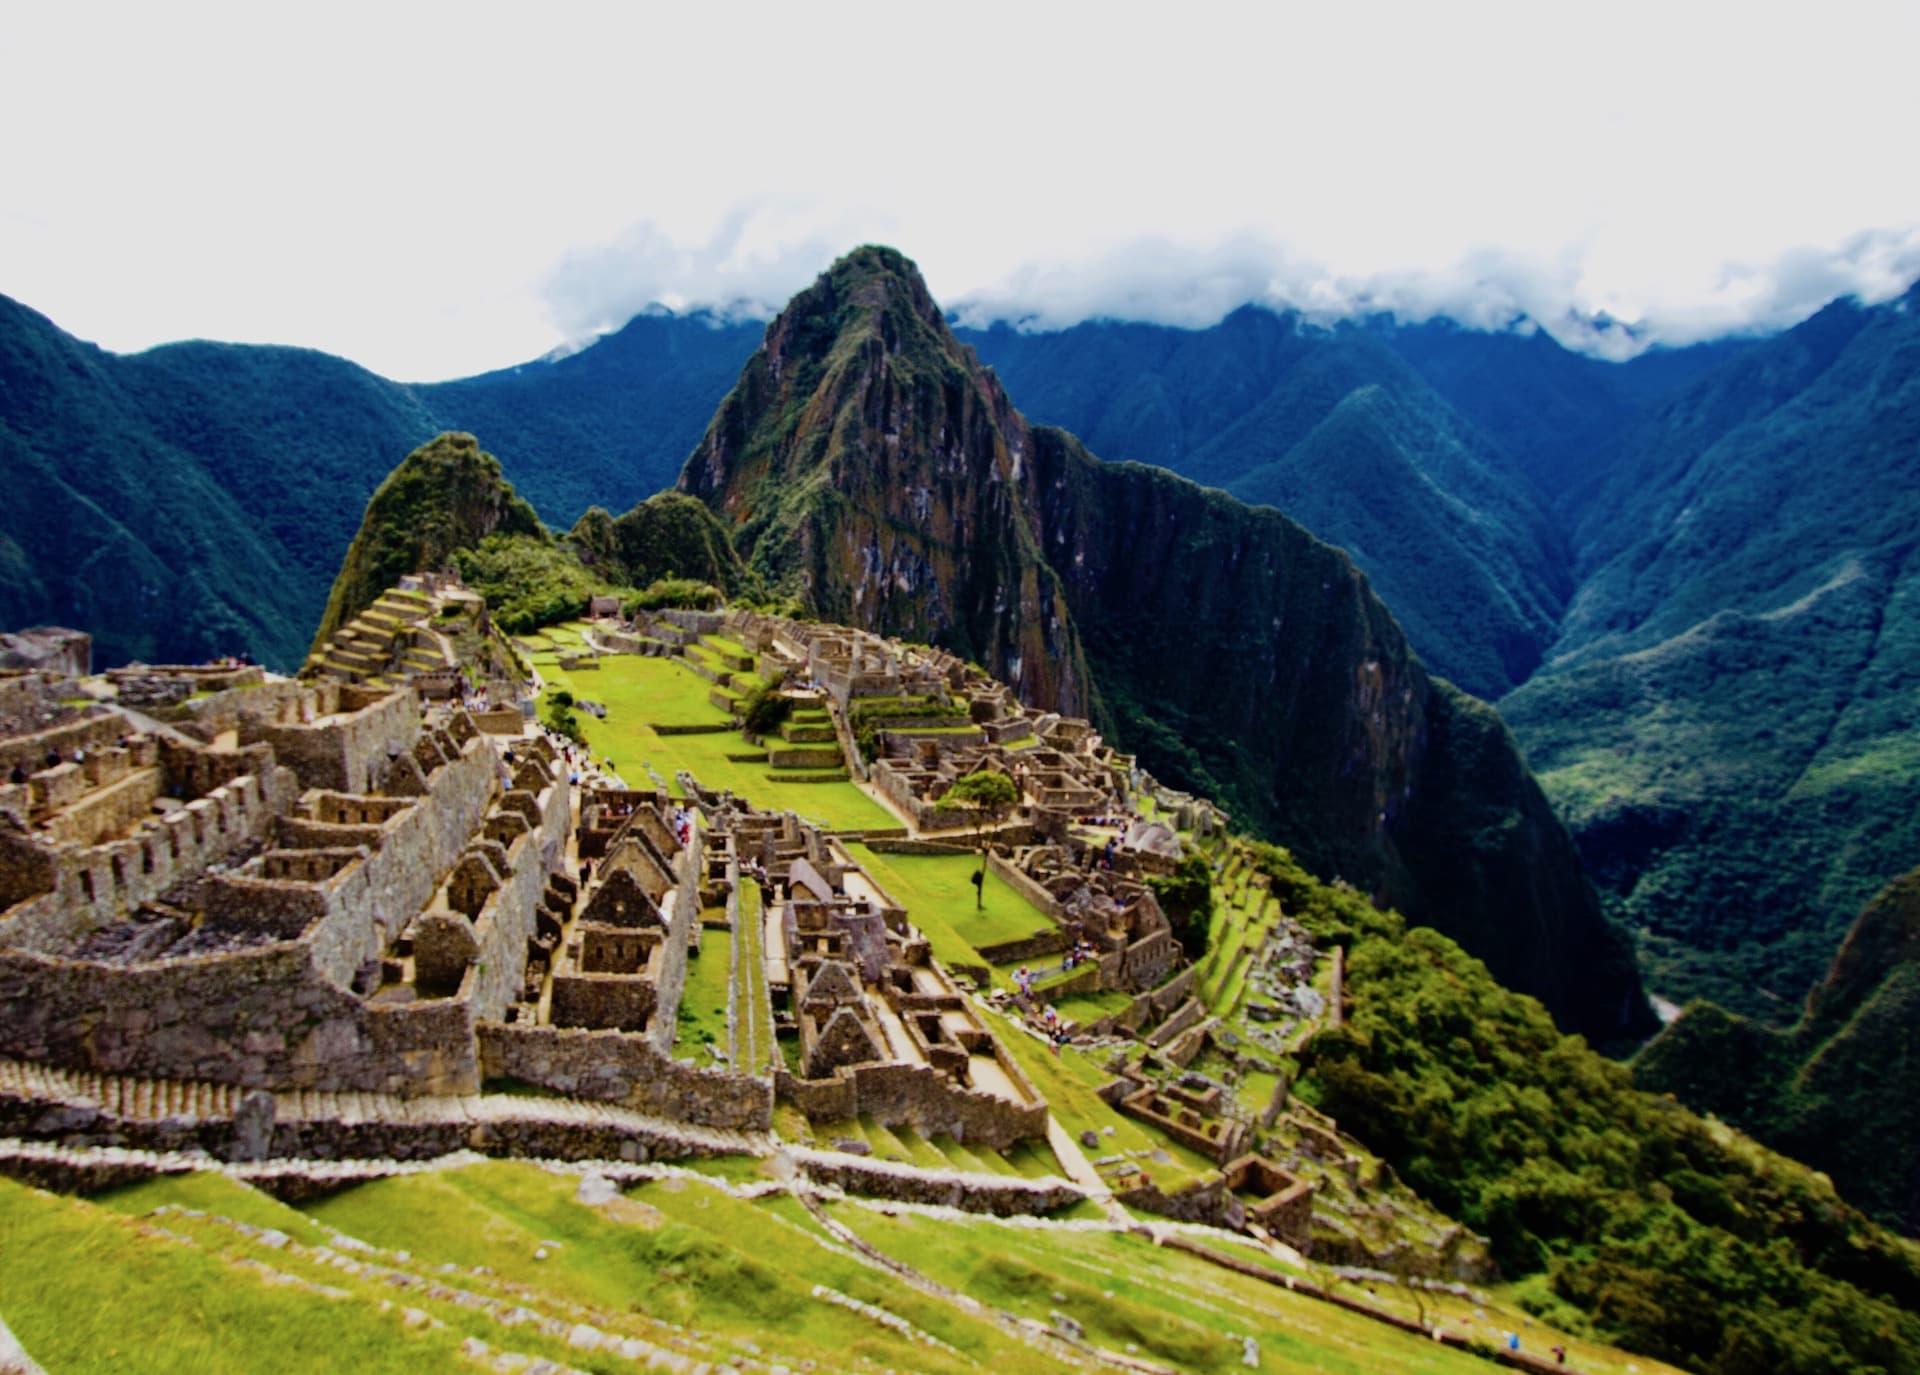 The First Principle Machu Picchu Post Expedition 19.jpg